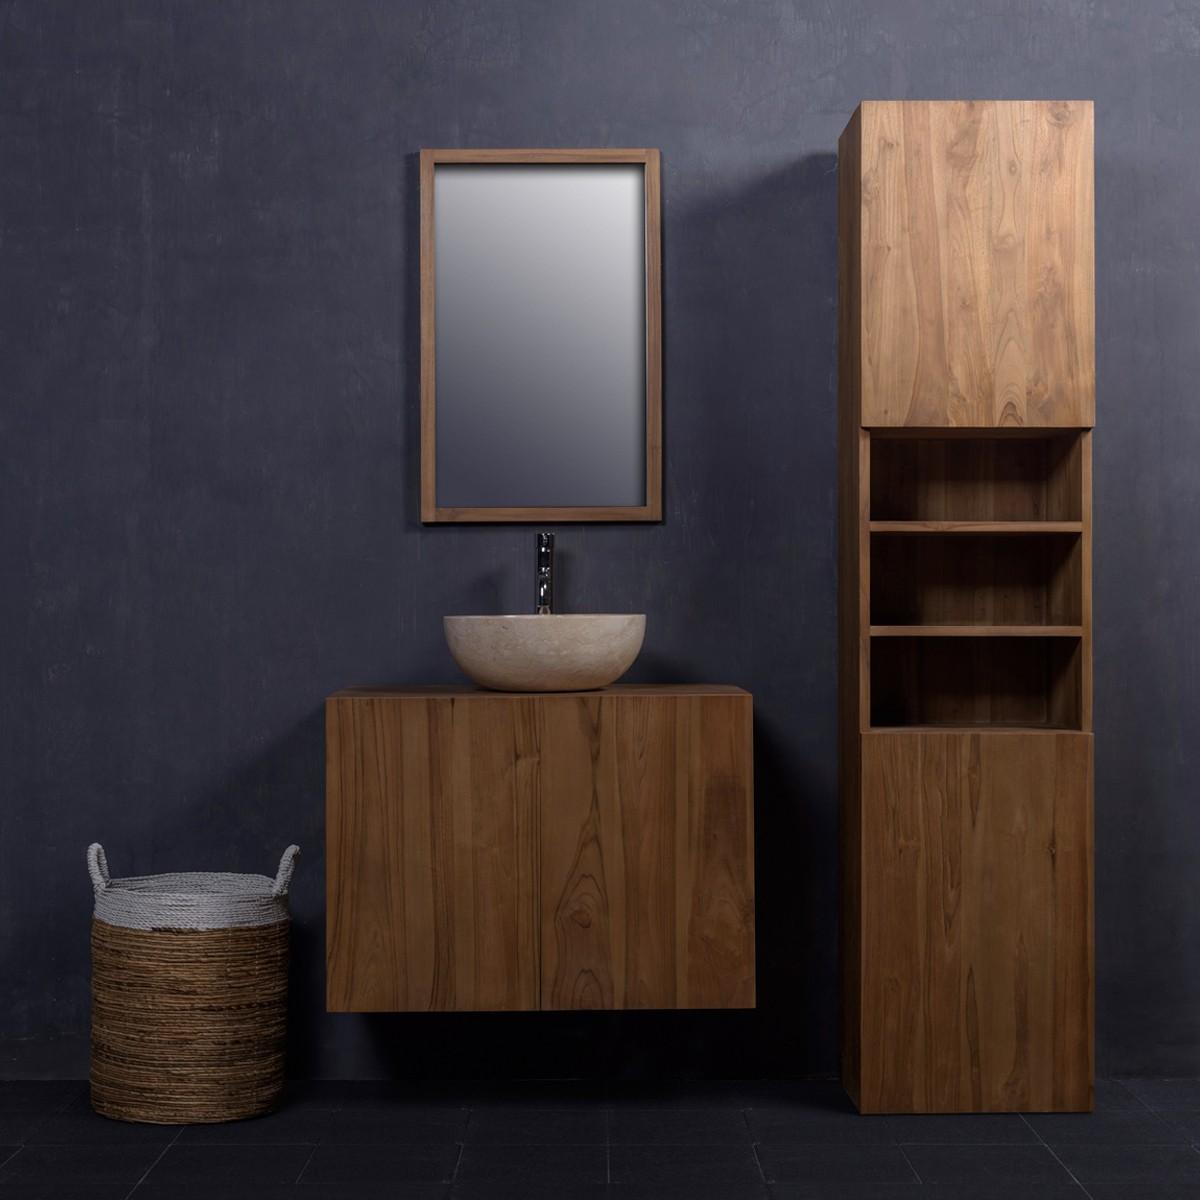 Salle de bain meuble bois maison moderne for Meuble de salle de bain moderne